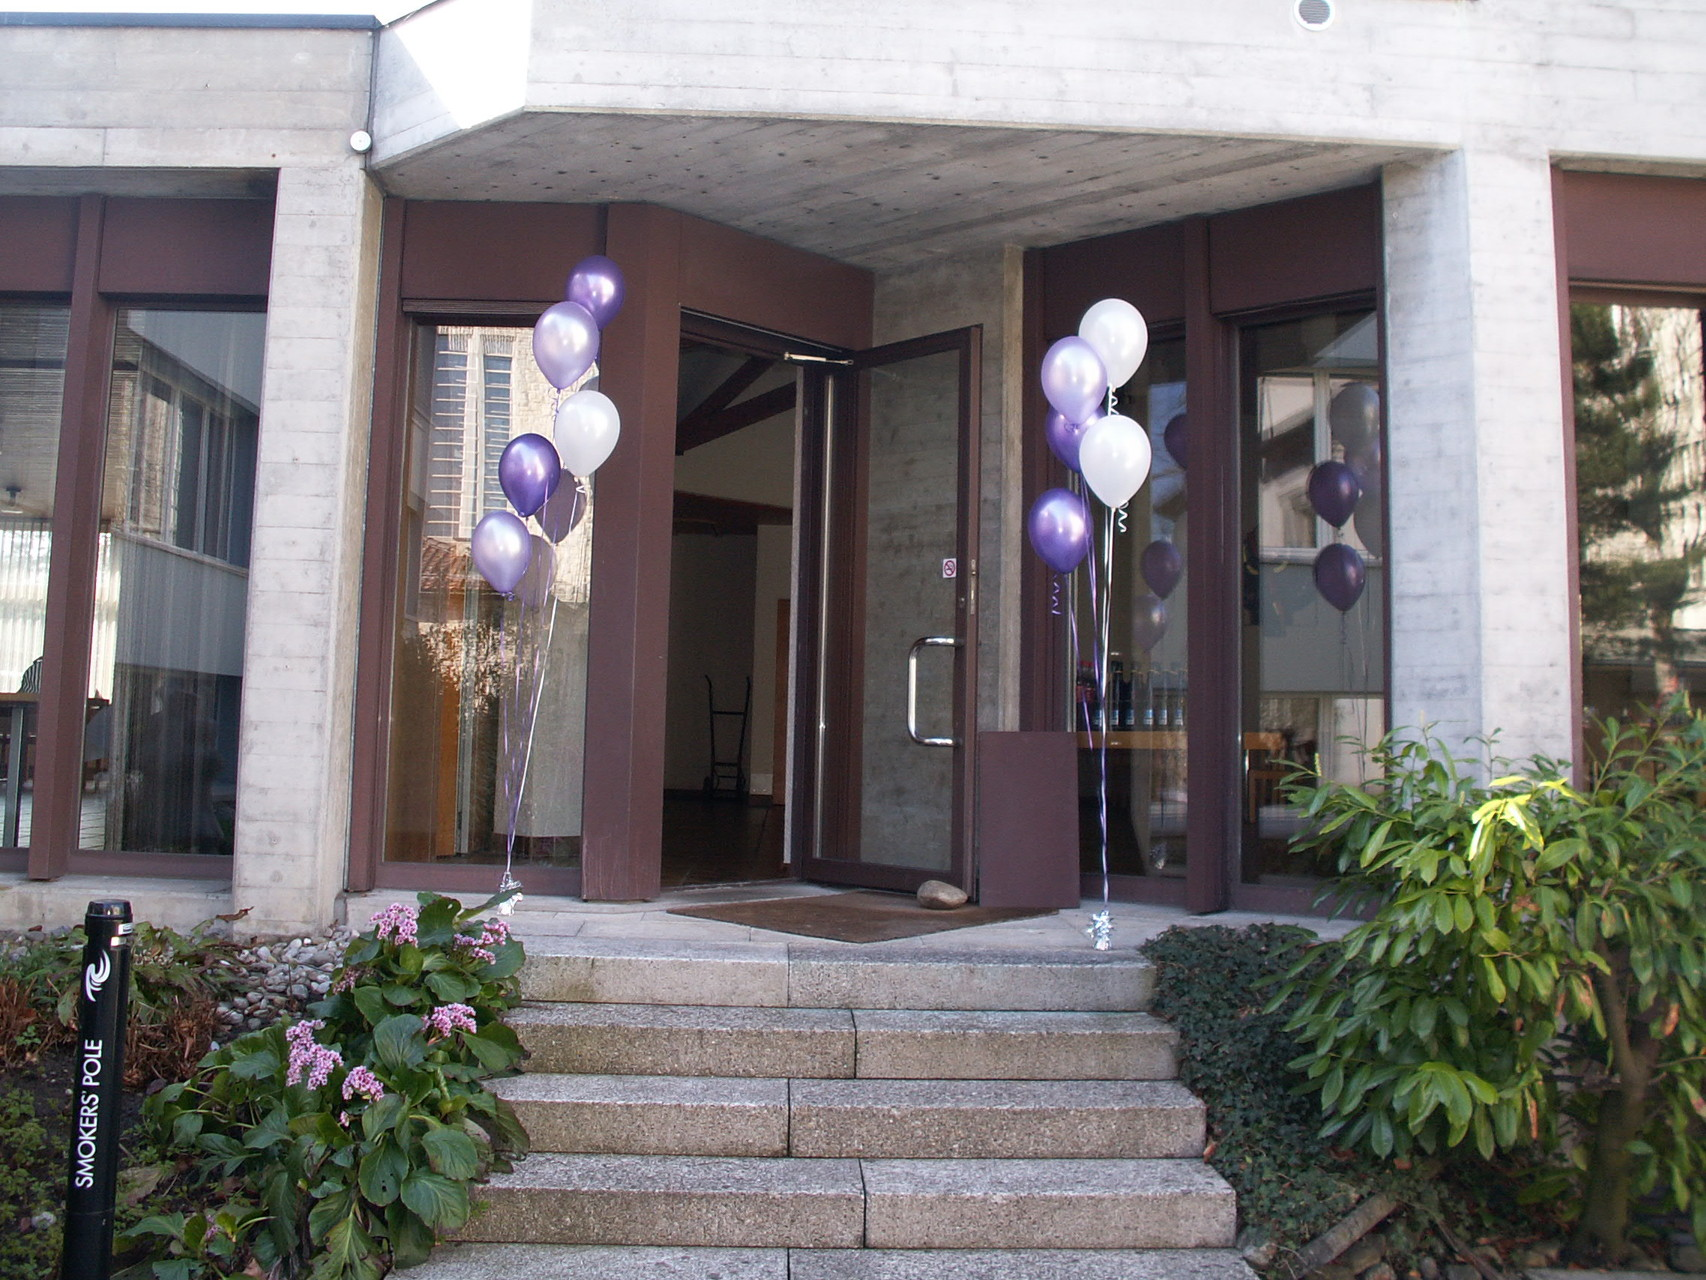 Heliumballons an Eingang